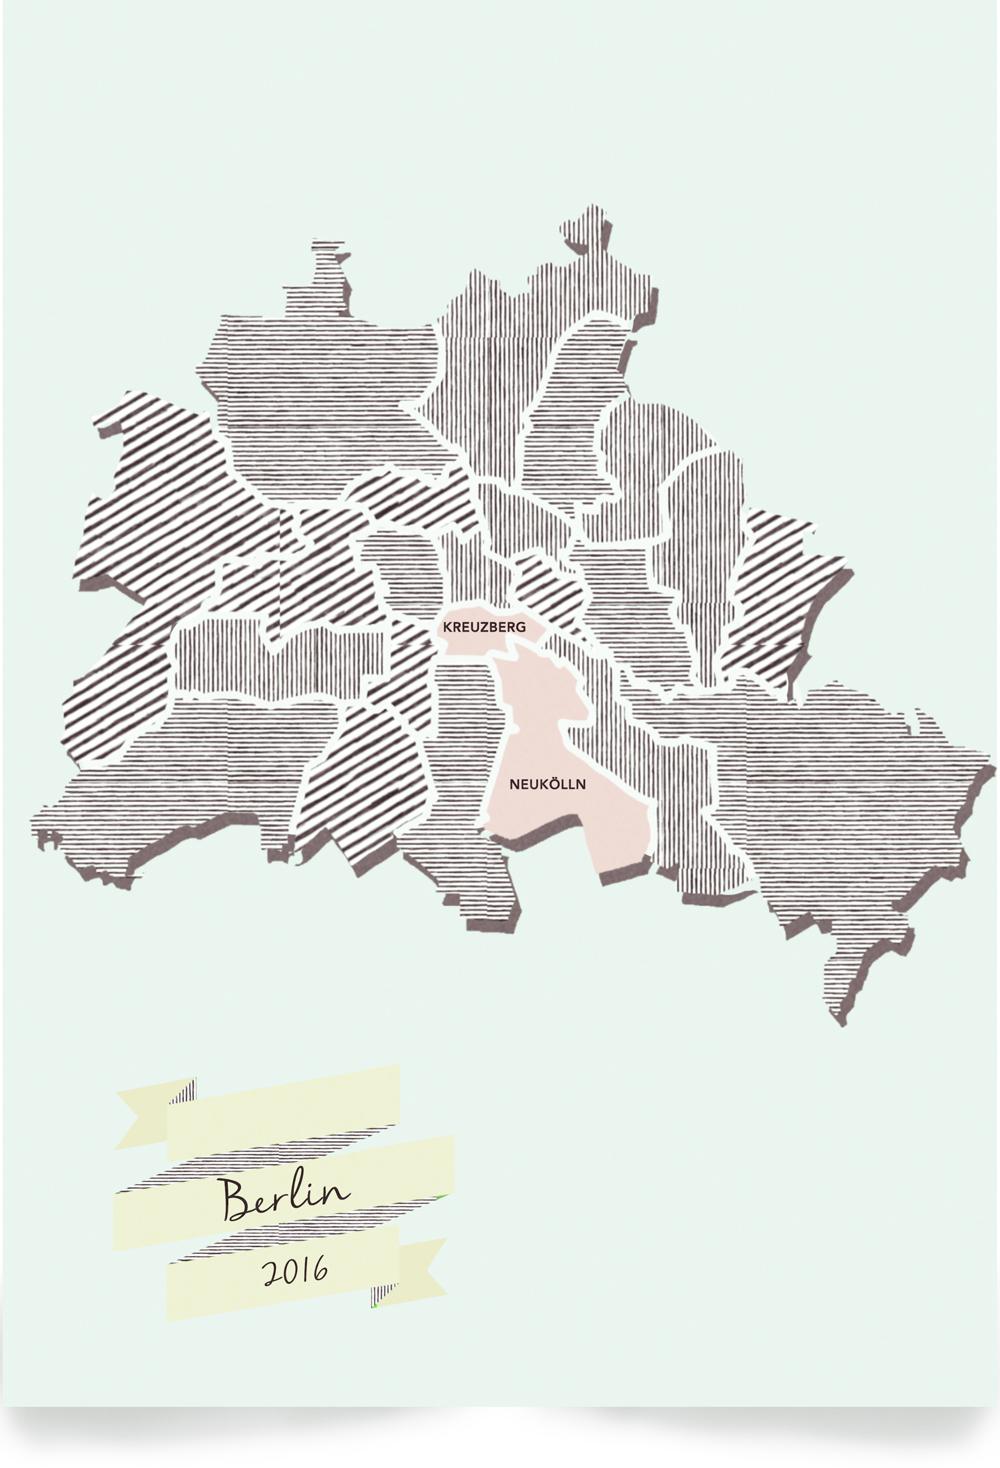 BERLIN | Map